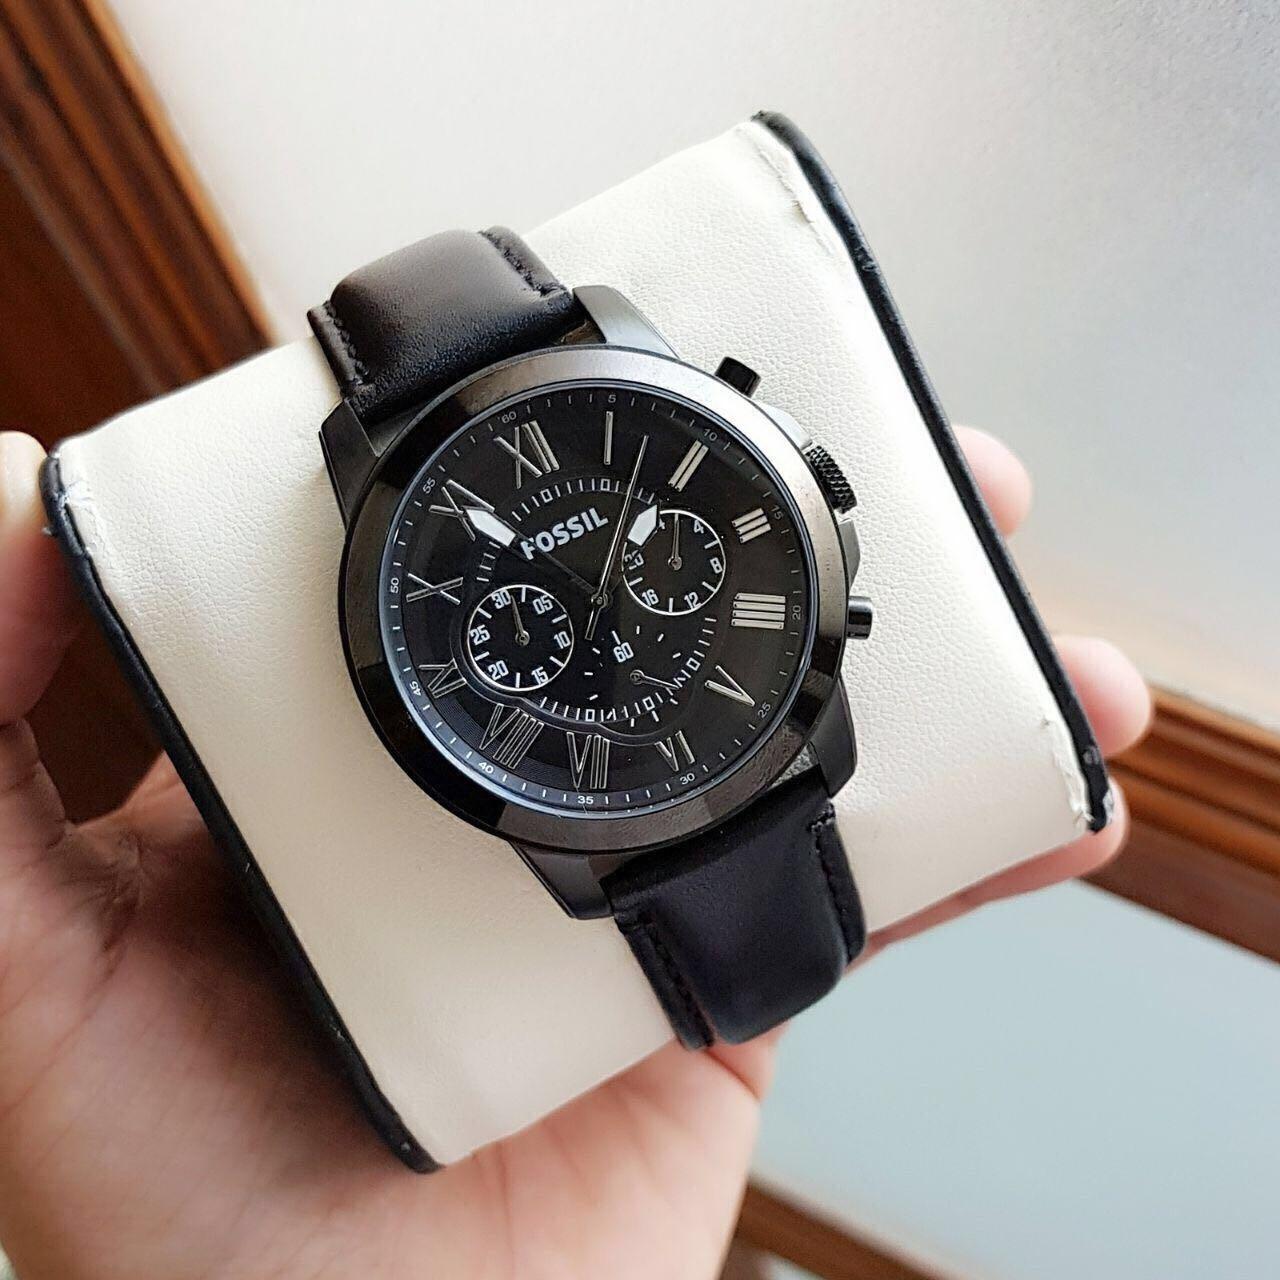 Shop101 watches